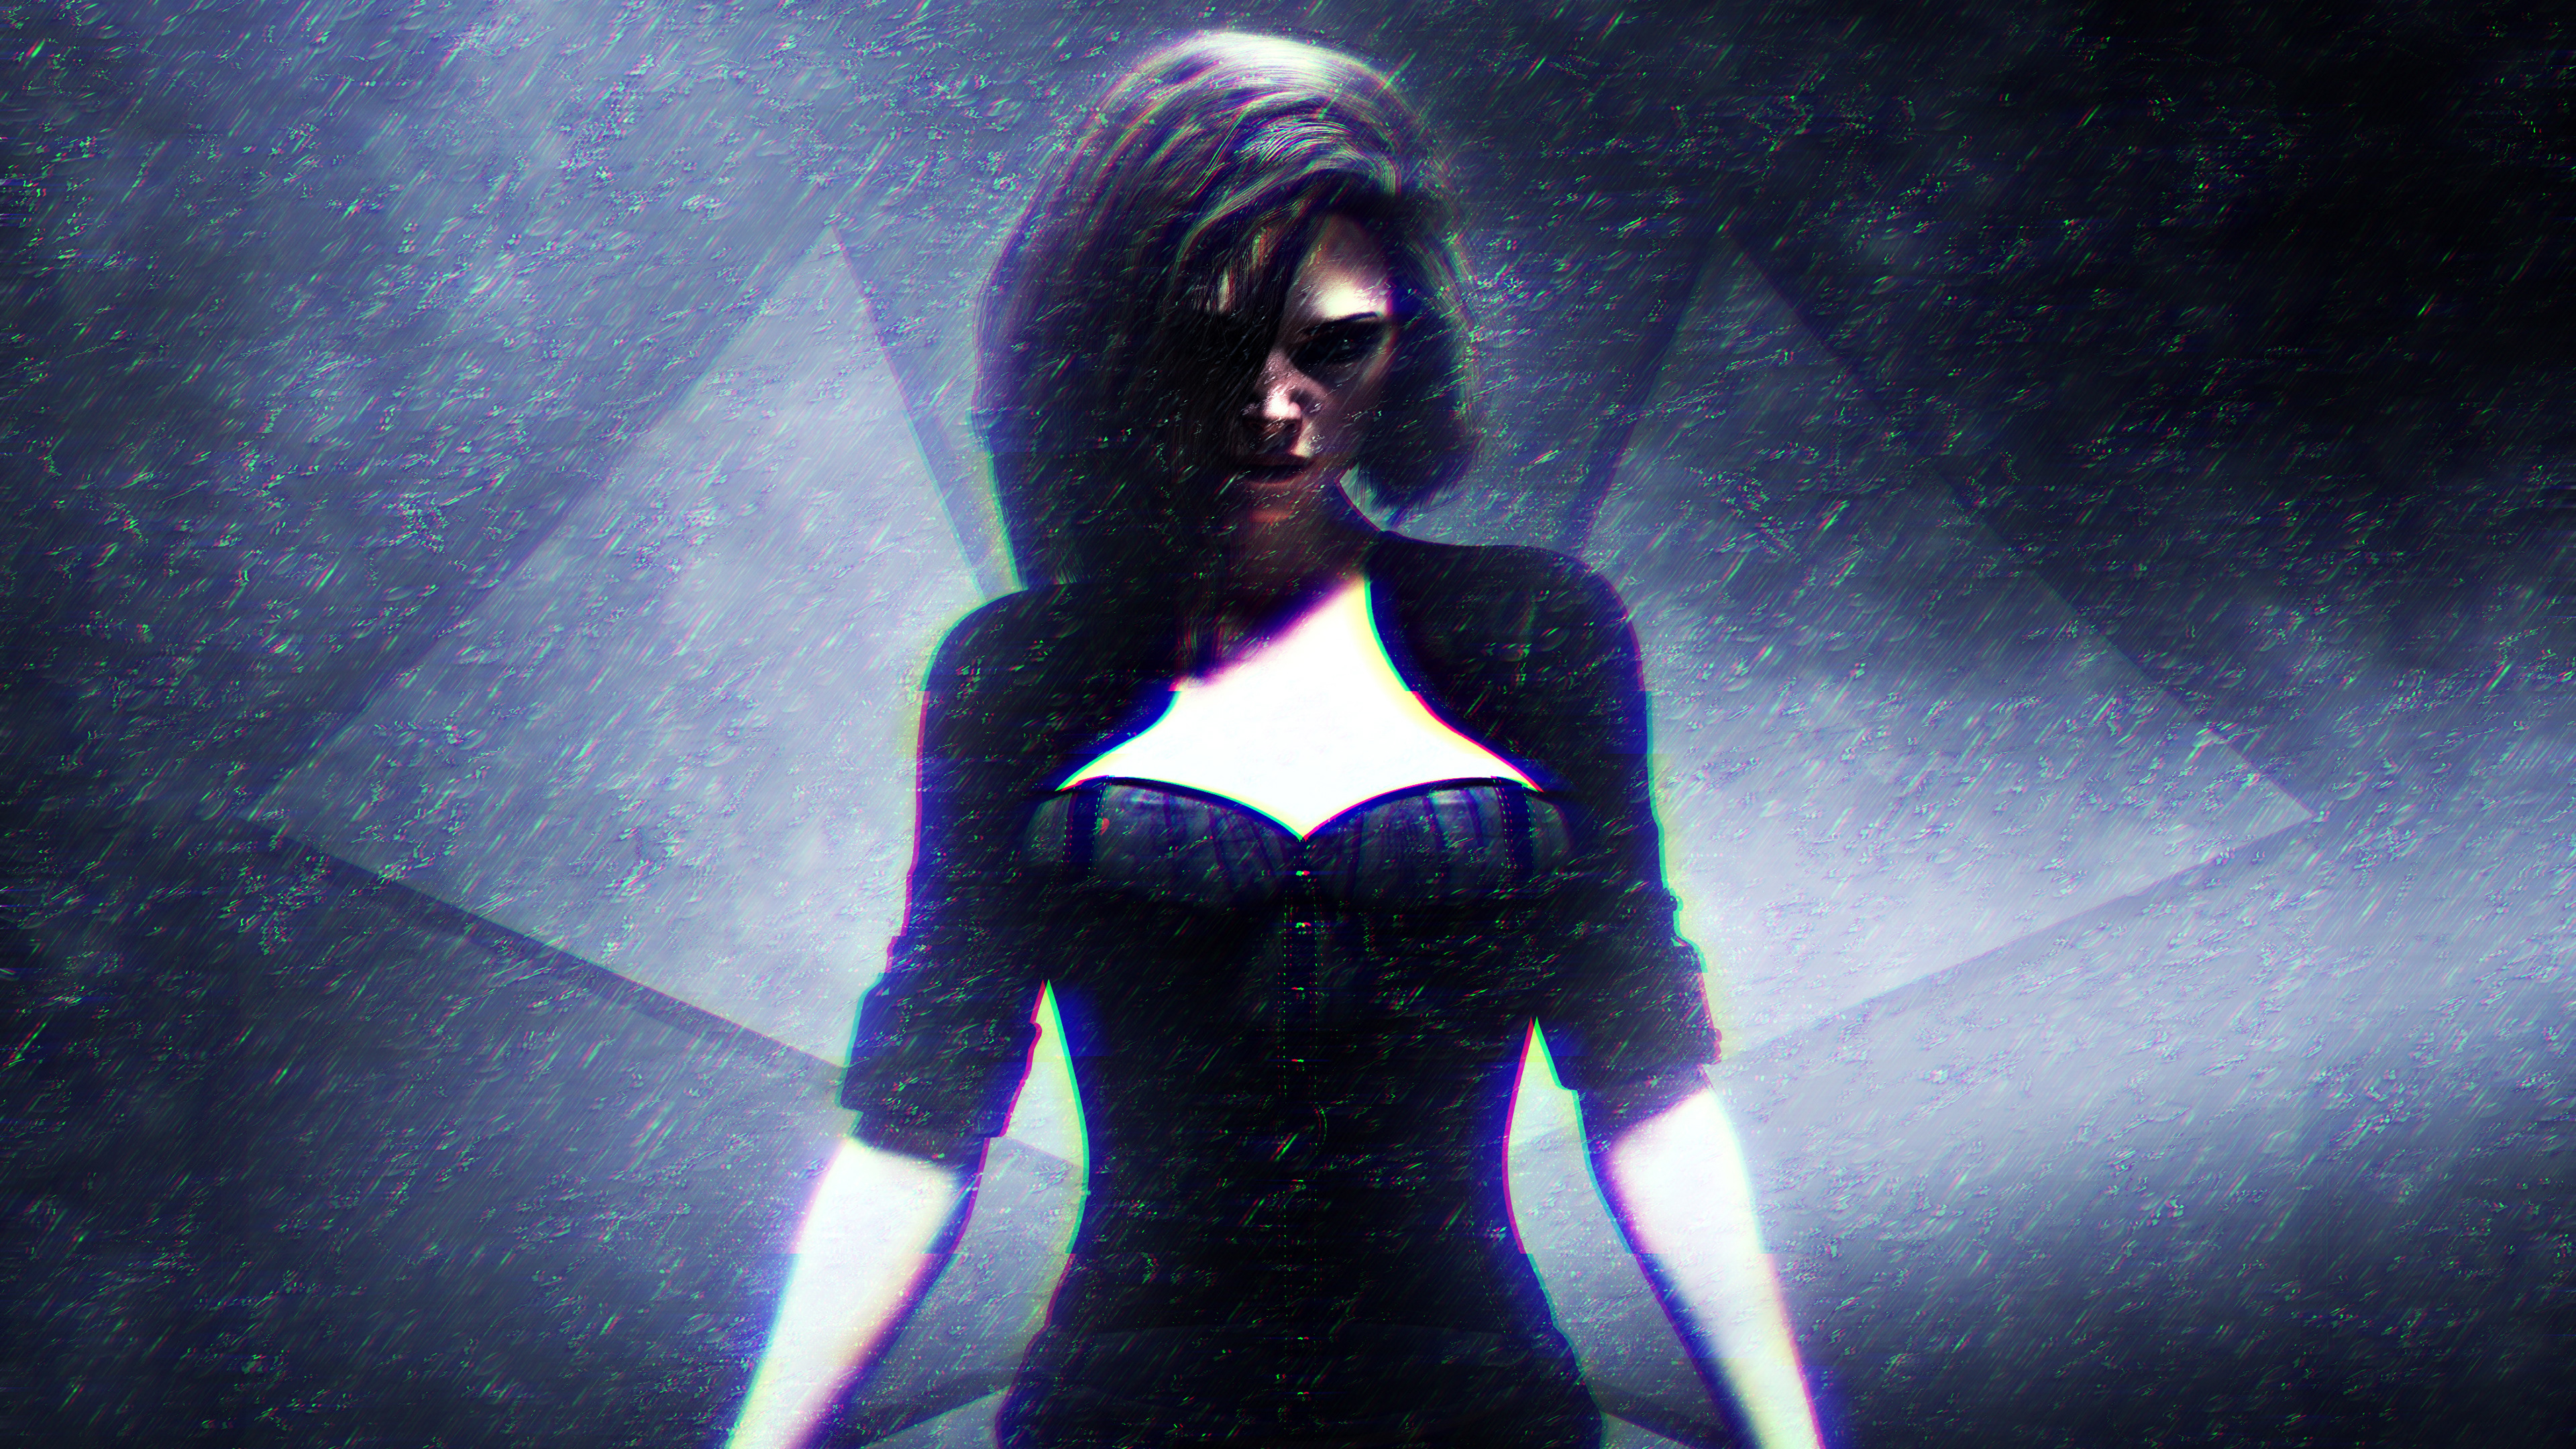 alice resident evil 4k 1554244434 - Alice Resident Evil 4k - resident evil 2 wallpapers, hd-wallpapers, games wallpapers, 4k-wallpapers, 2019 games wallpapers